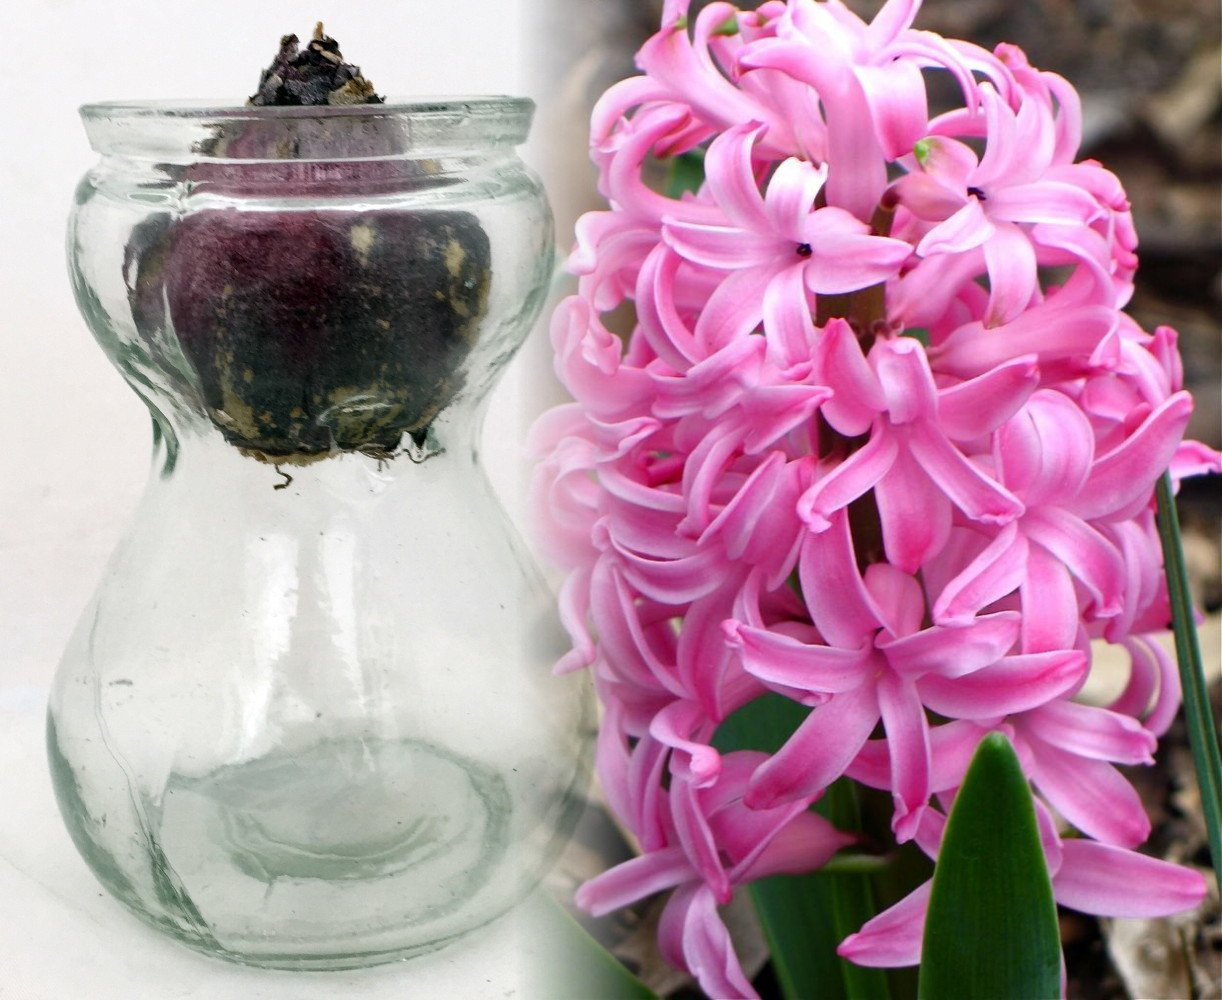 Amazon clear glass hyacinth vase pink hyacinth bulb amazon clear glass hyacinth vase pink hyacinth bulb garden outdoor reviewsmspy